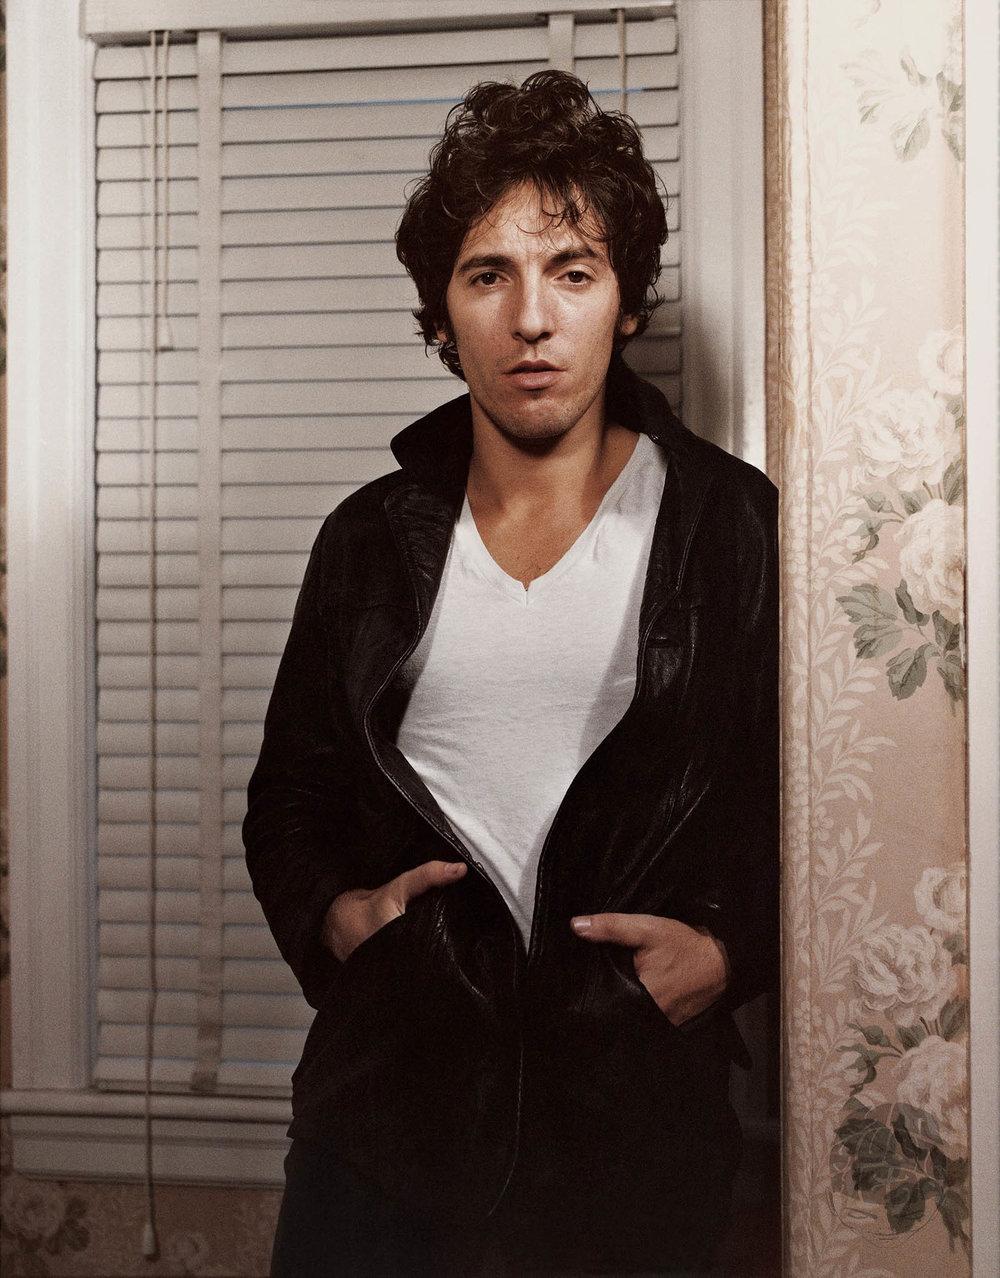 frank stefanko_Bruce  Springsteen_DARKNESS_COVER-2.jpg